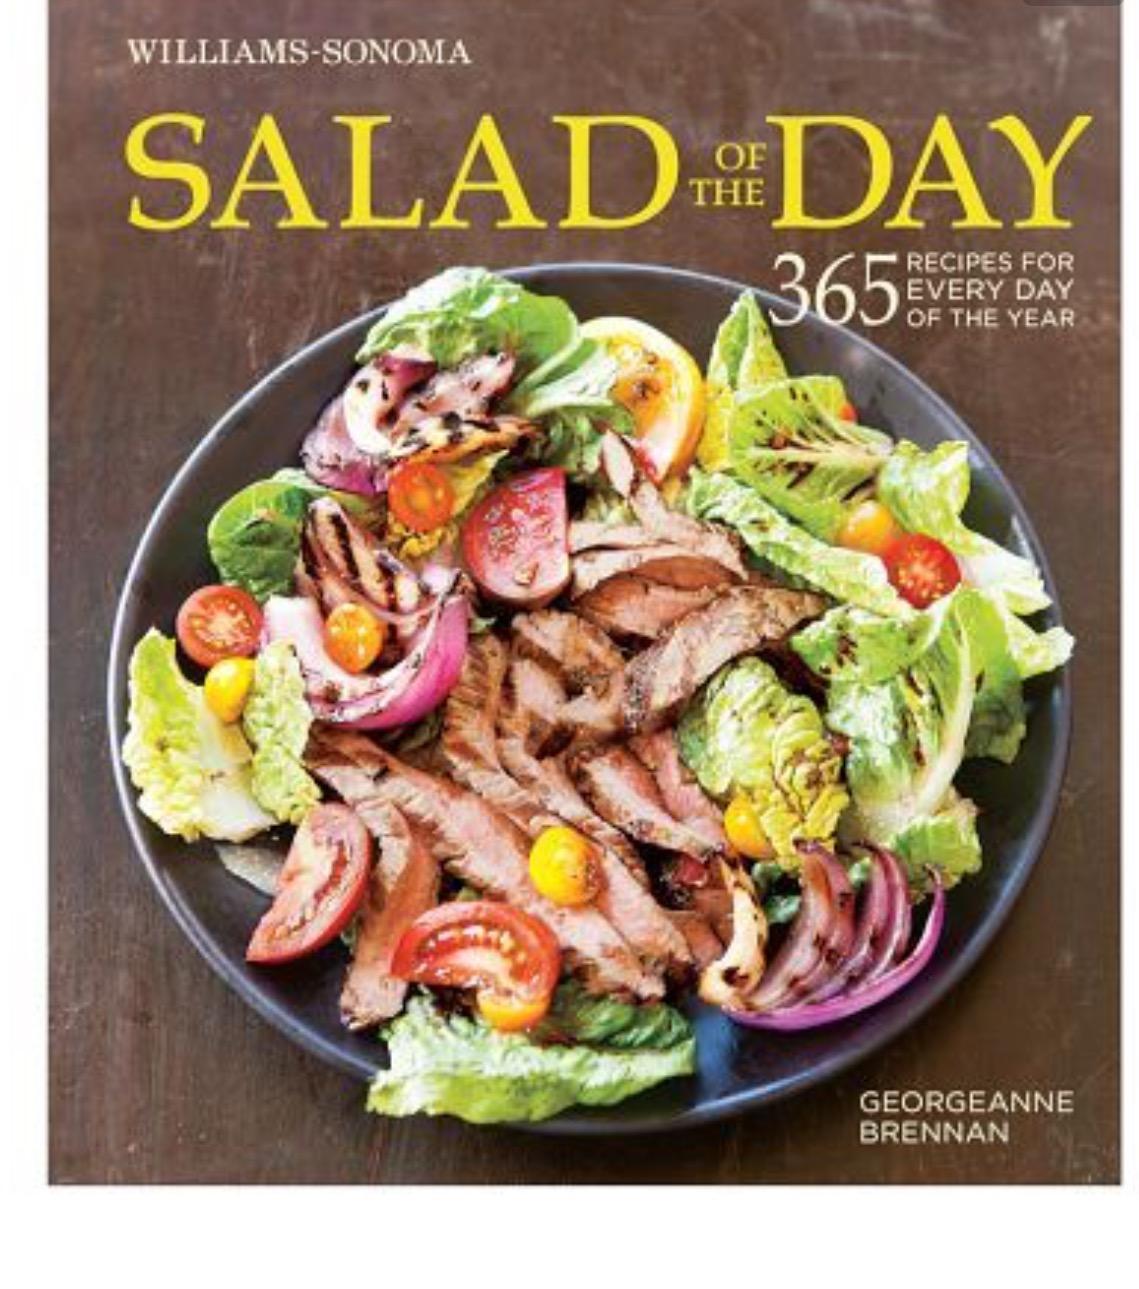 Williams and Sonoma cookbook